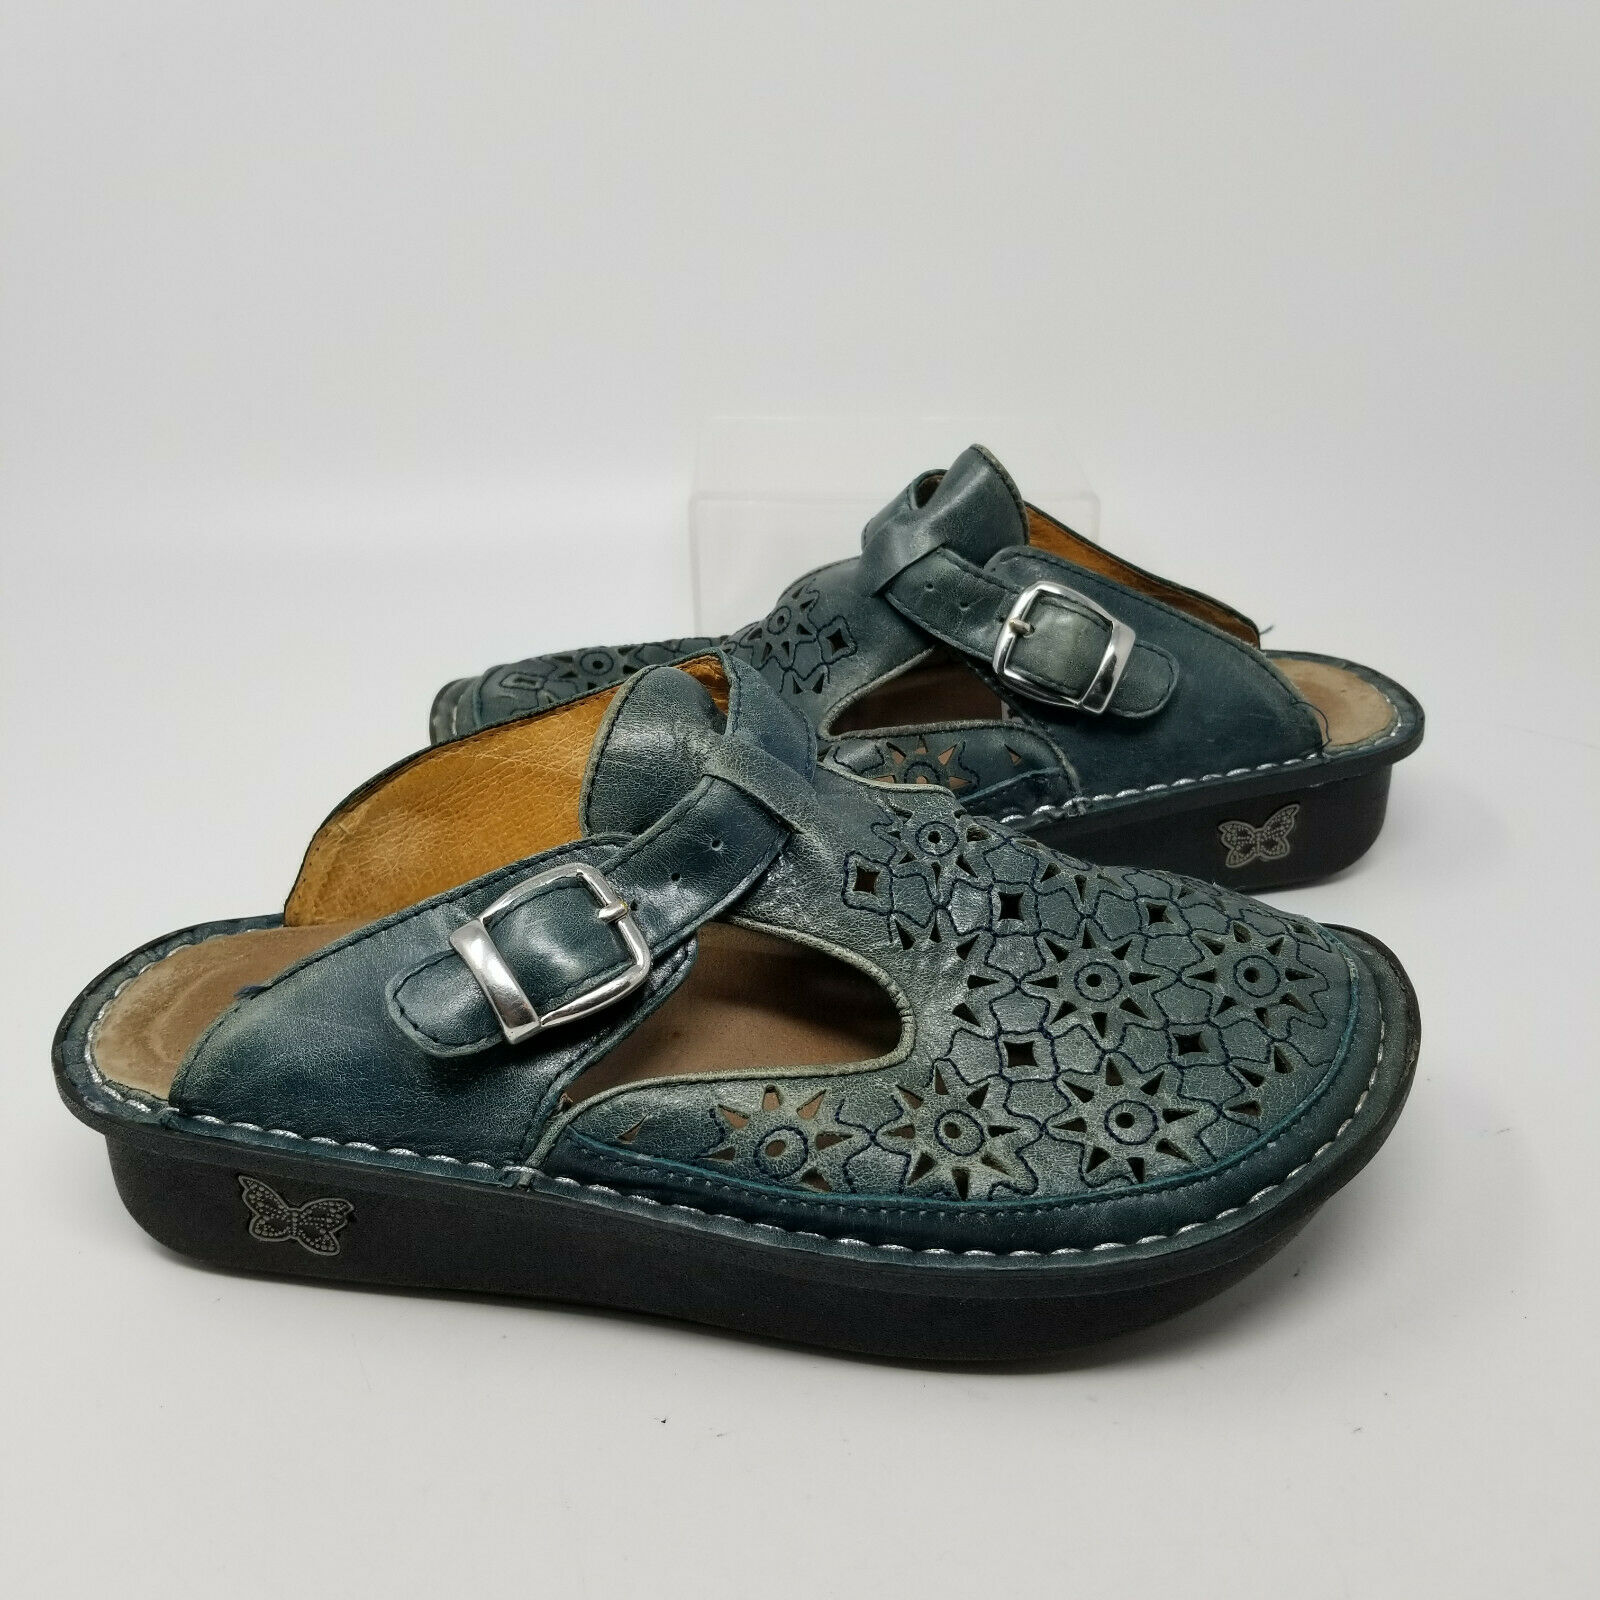 Alegria Green Leather Buckle Slip On Walking Mule Clog Shoes Women Size 7/37